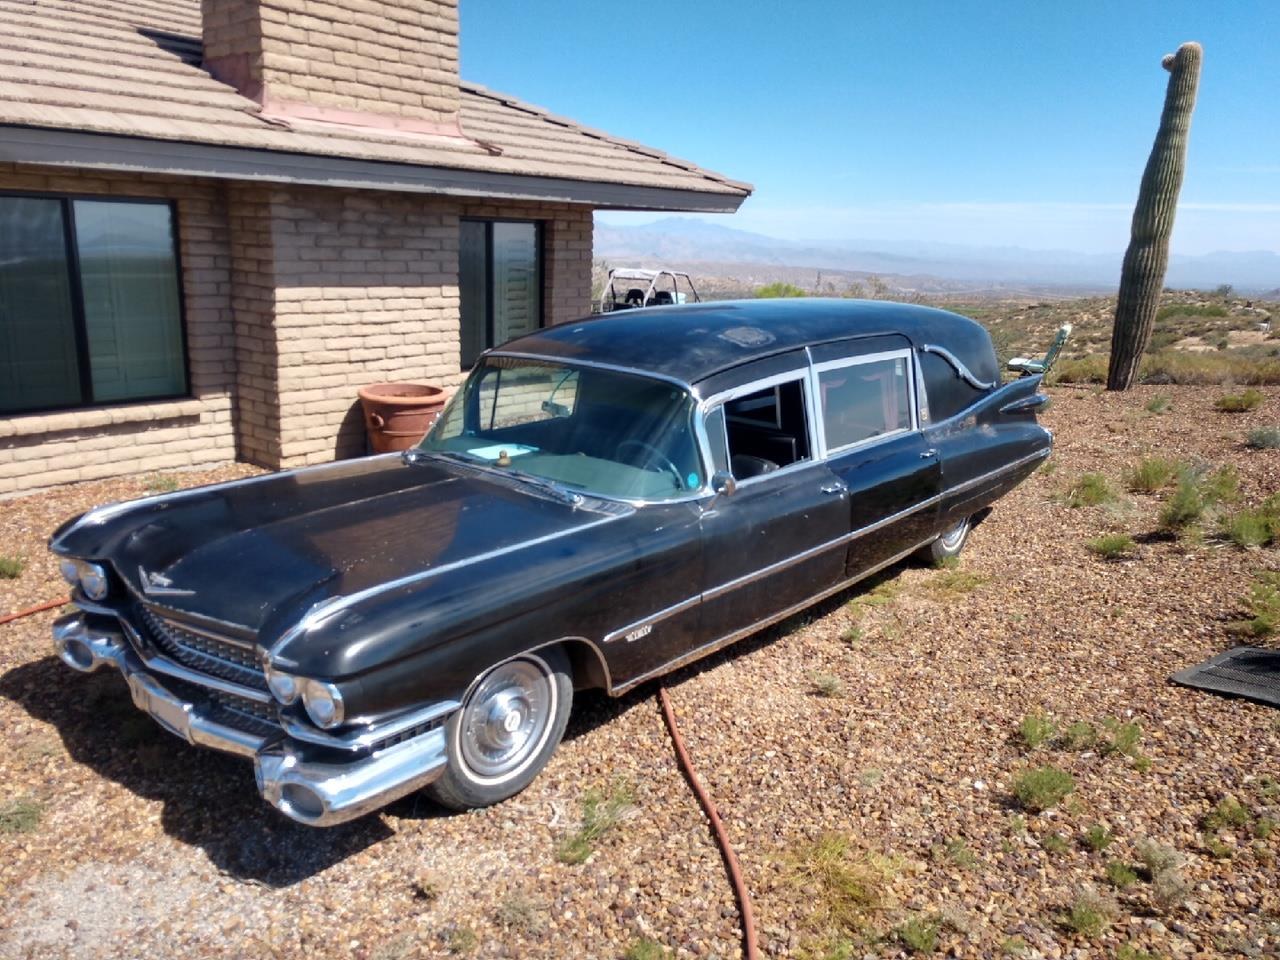 1959 Cadillac Hearse For Sale Classiccars Com Cc 1070862